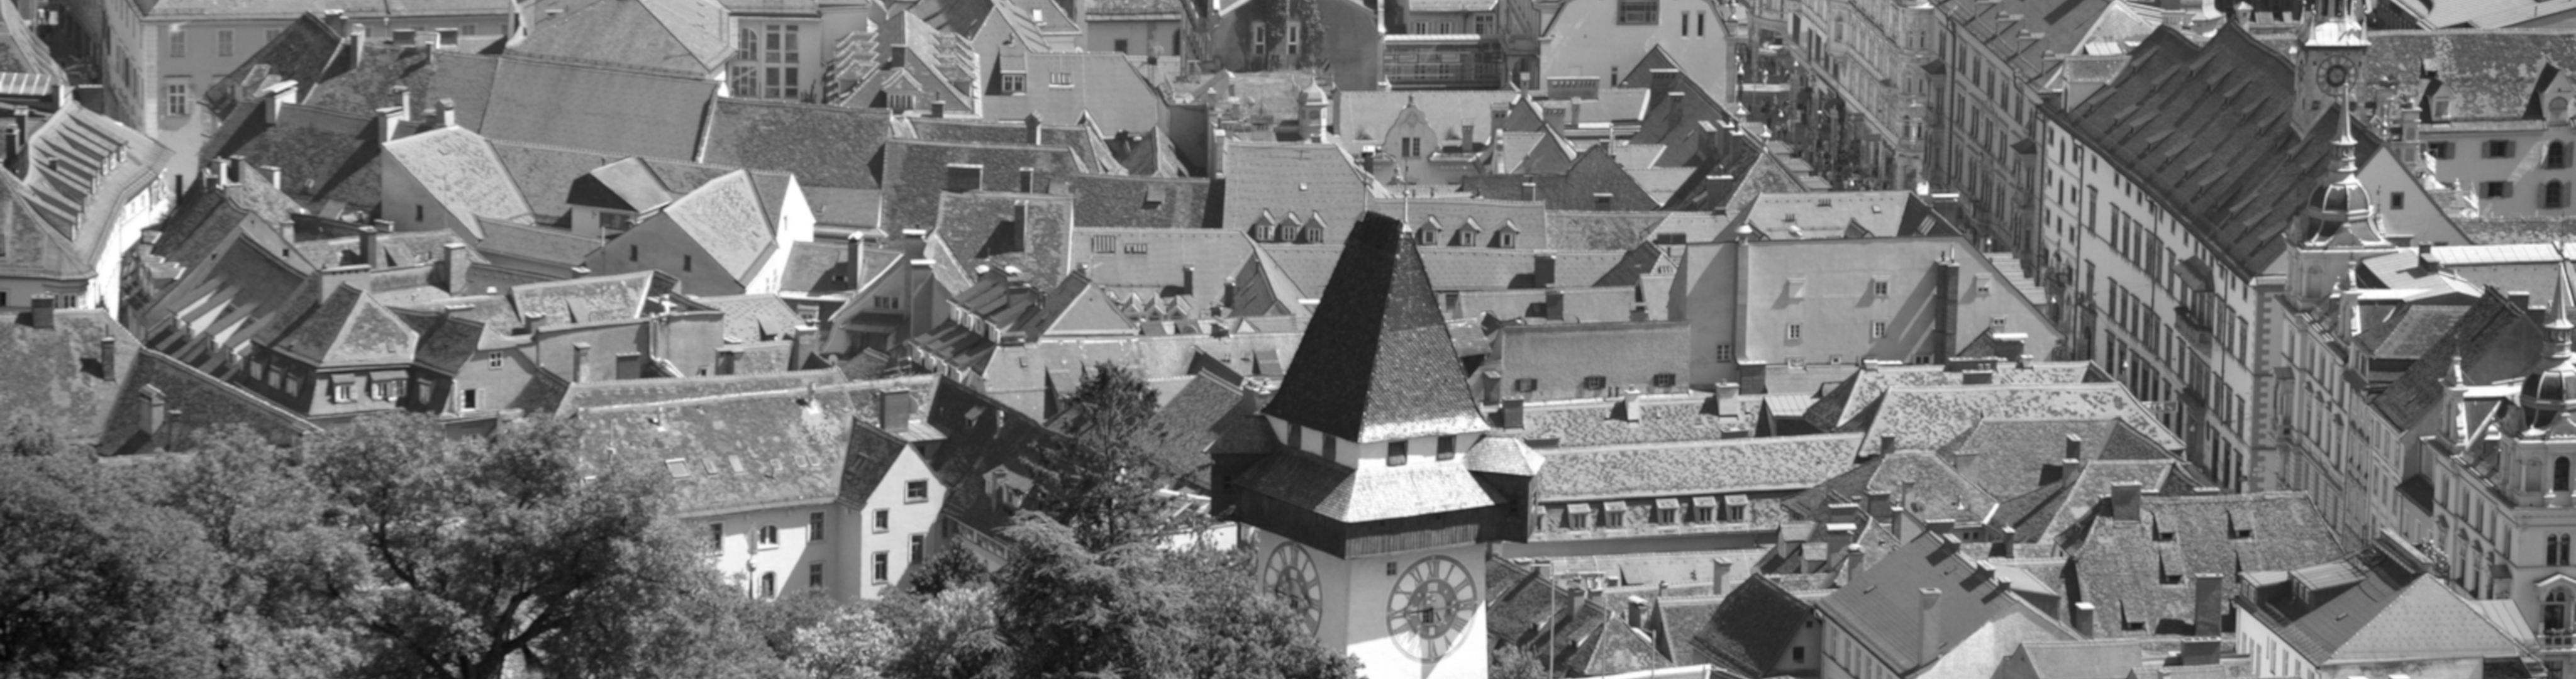 Schlossberg (c) Graz Tourismus – Harry Schiffer_4096x1080